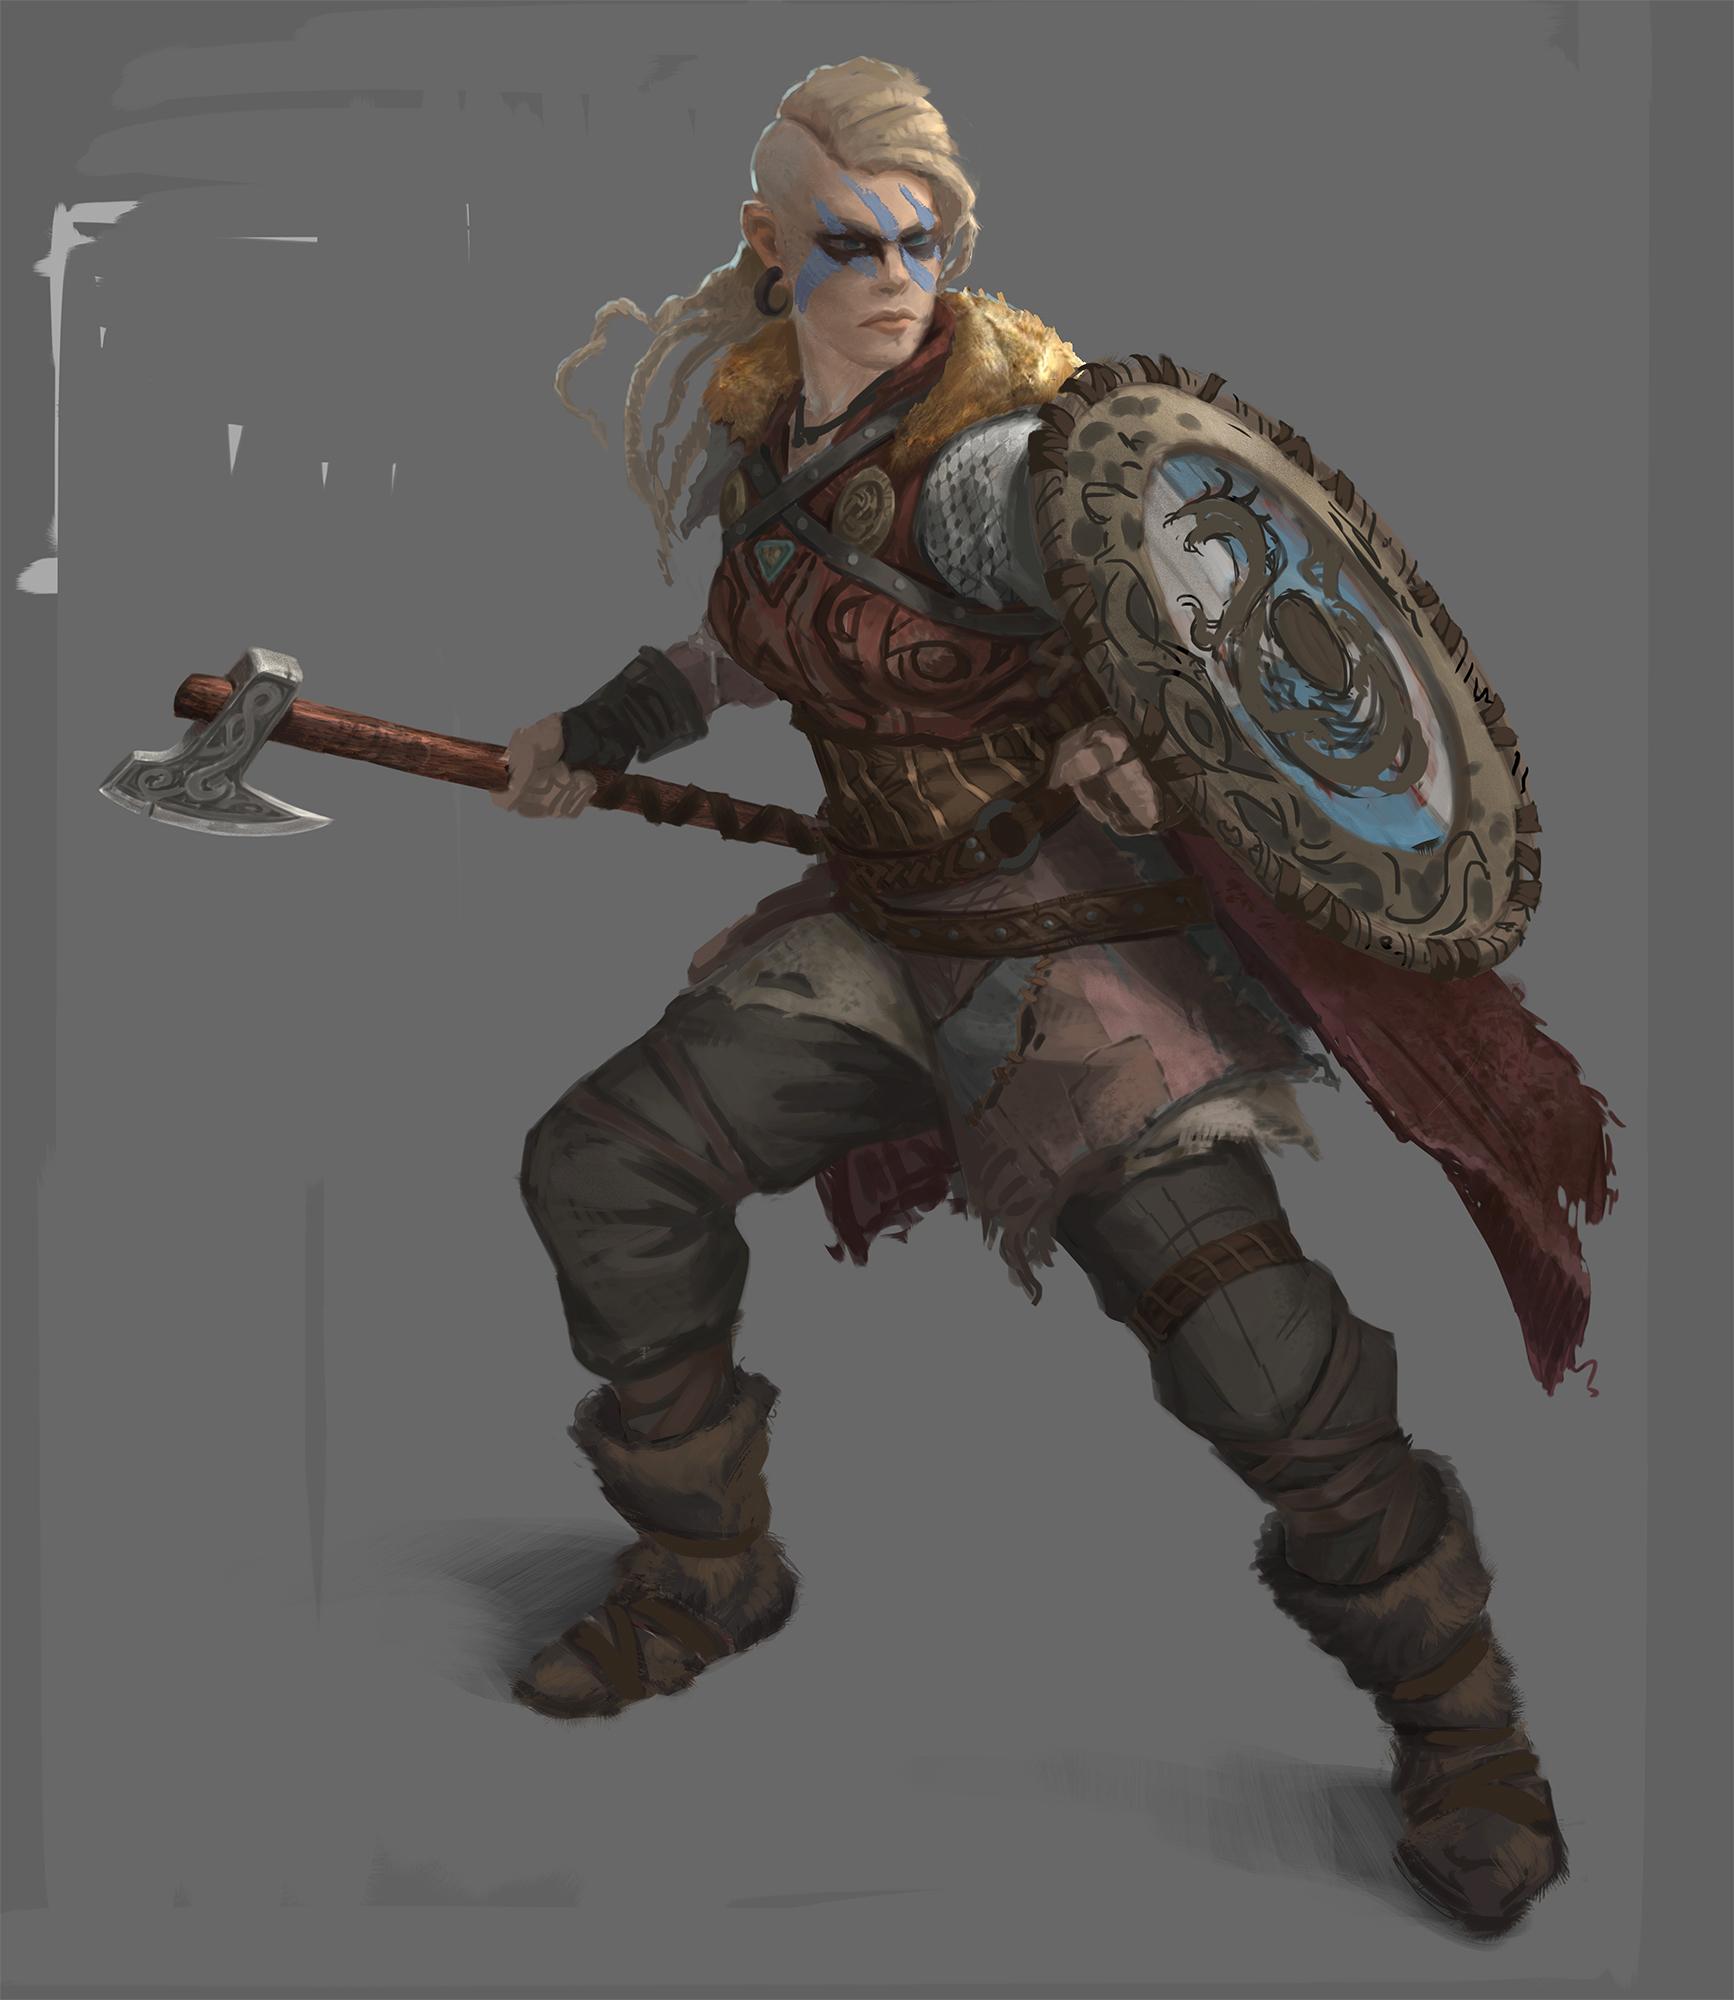 ConceptArt_Viking_REF_Shield_Maiden_V13_by_JLW.jpg